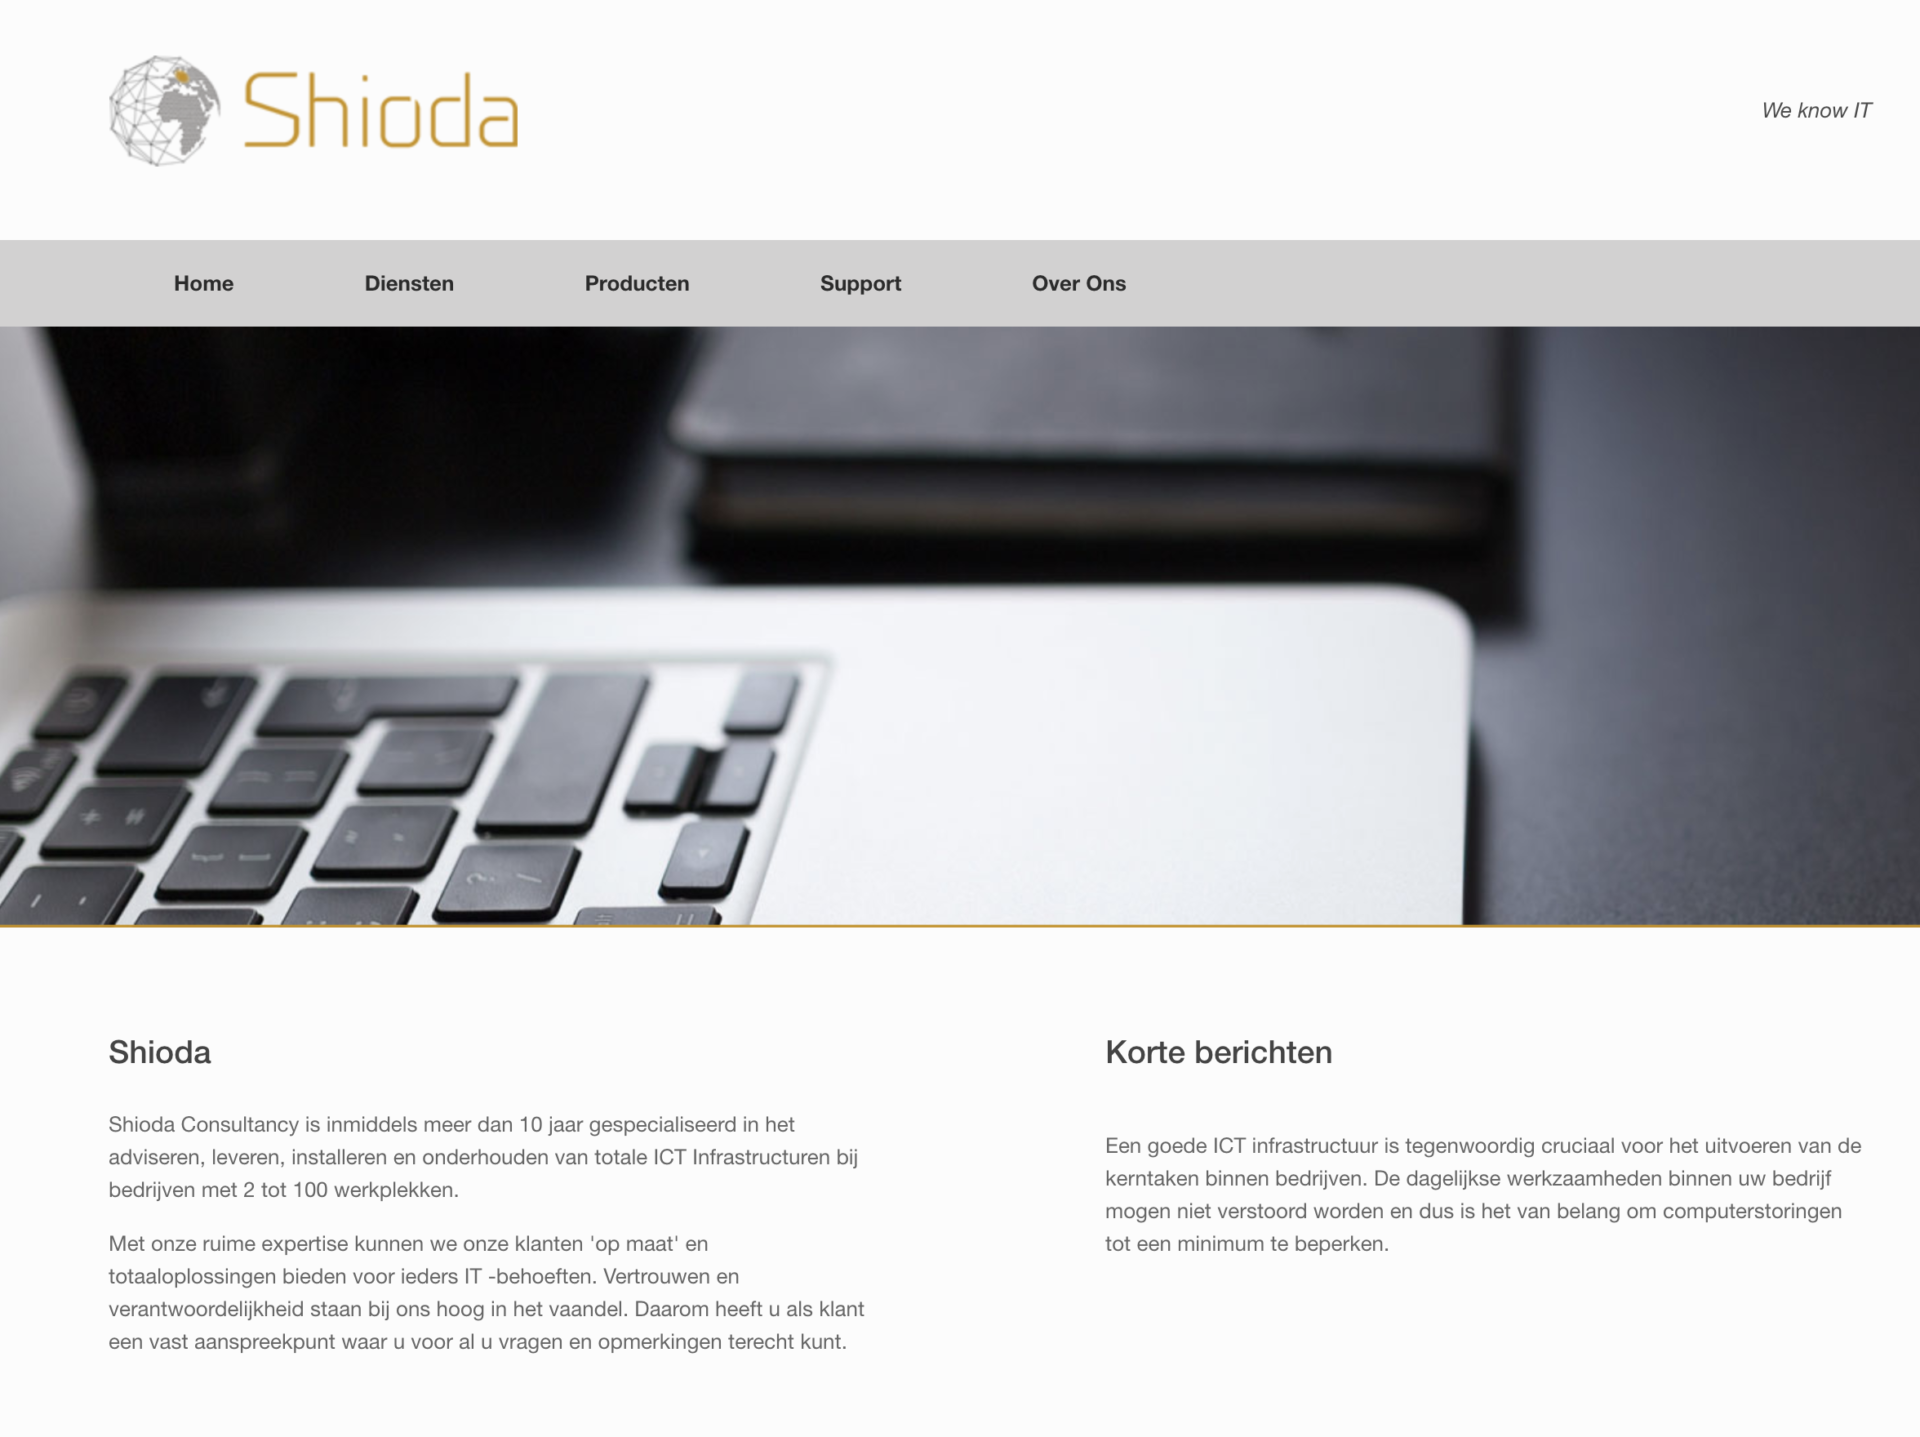 Hole 14: Shioda